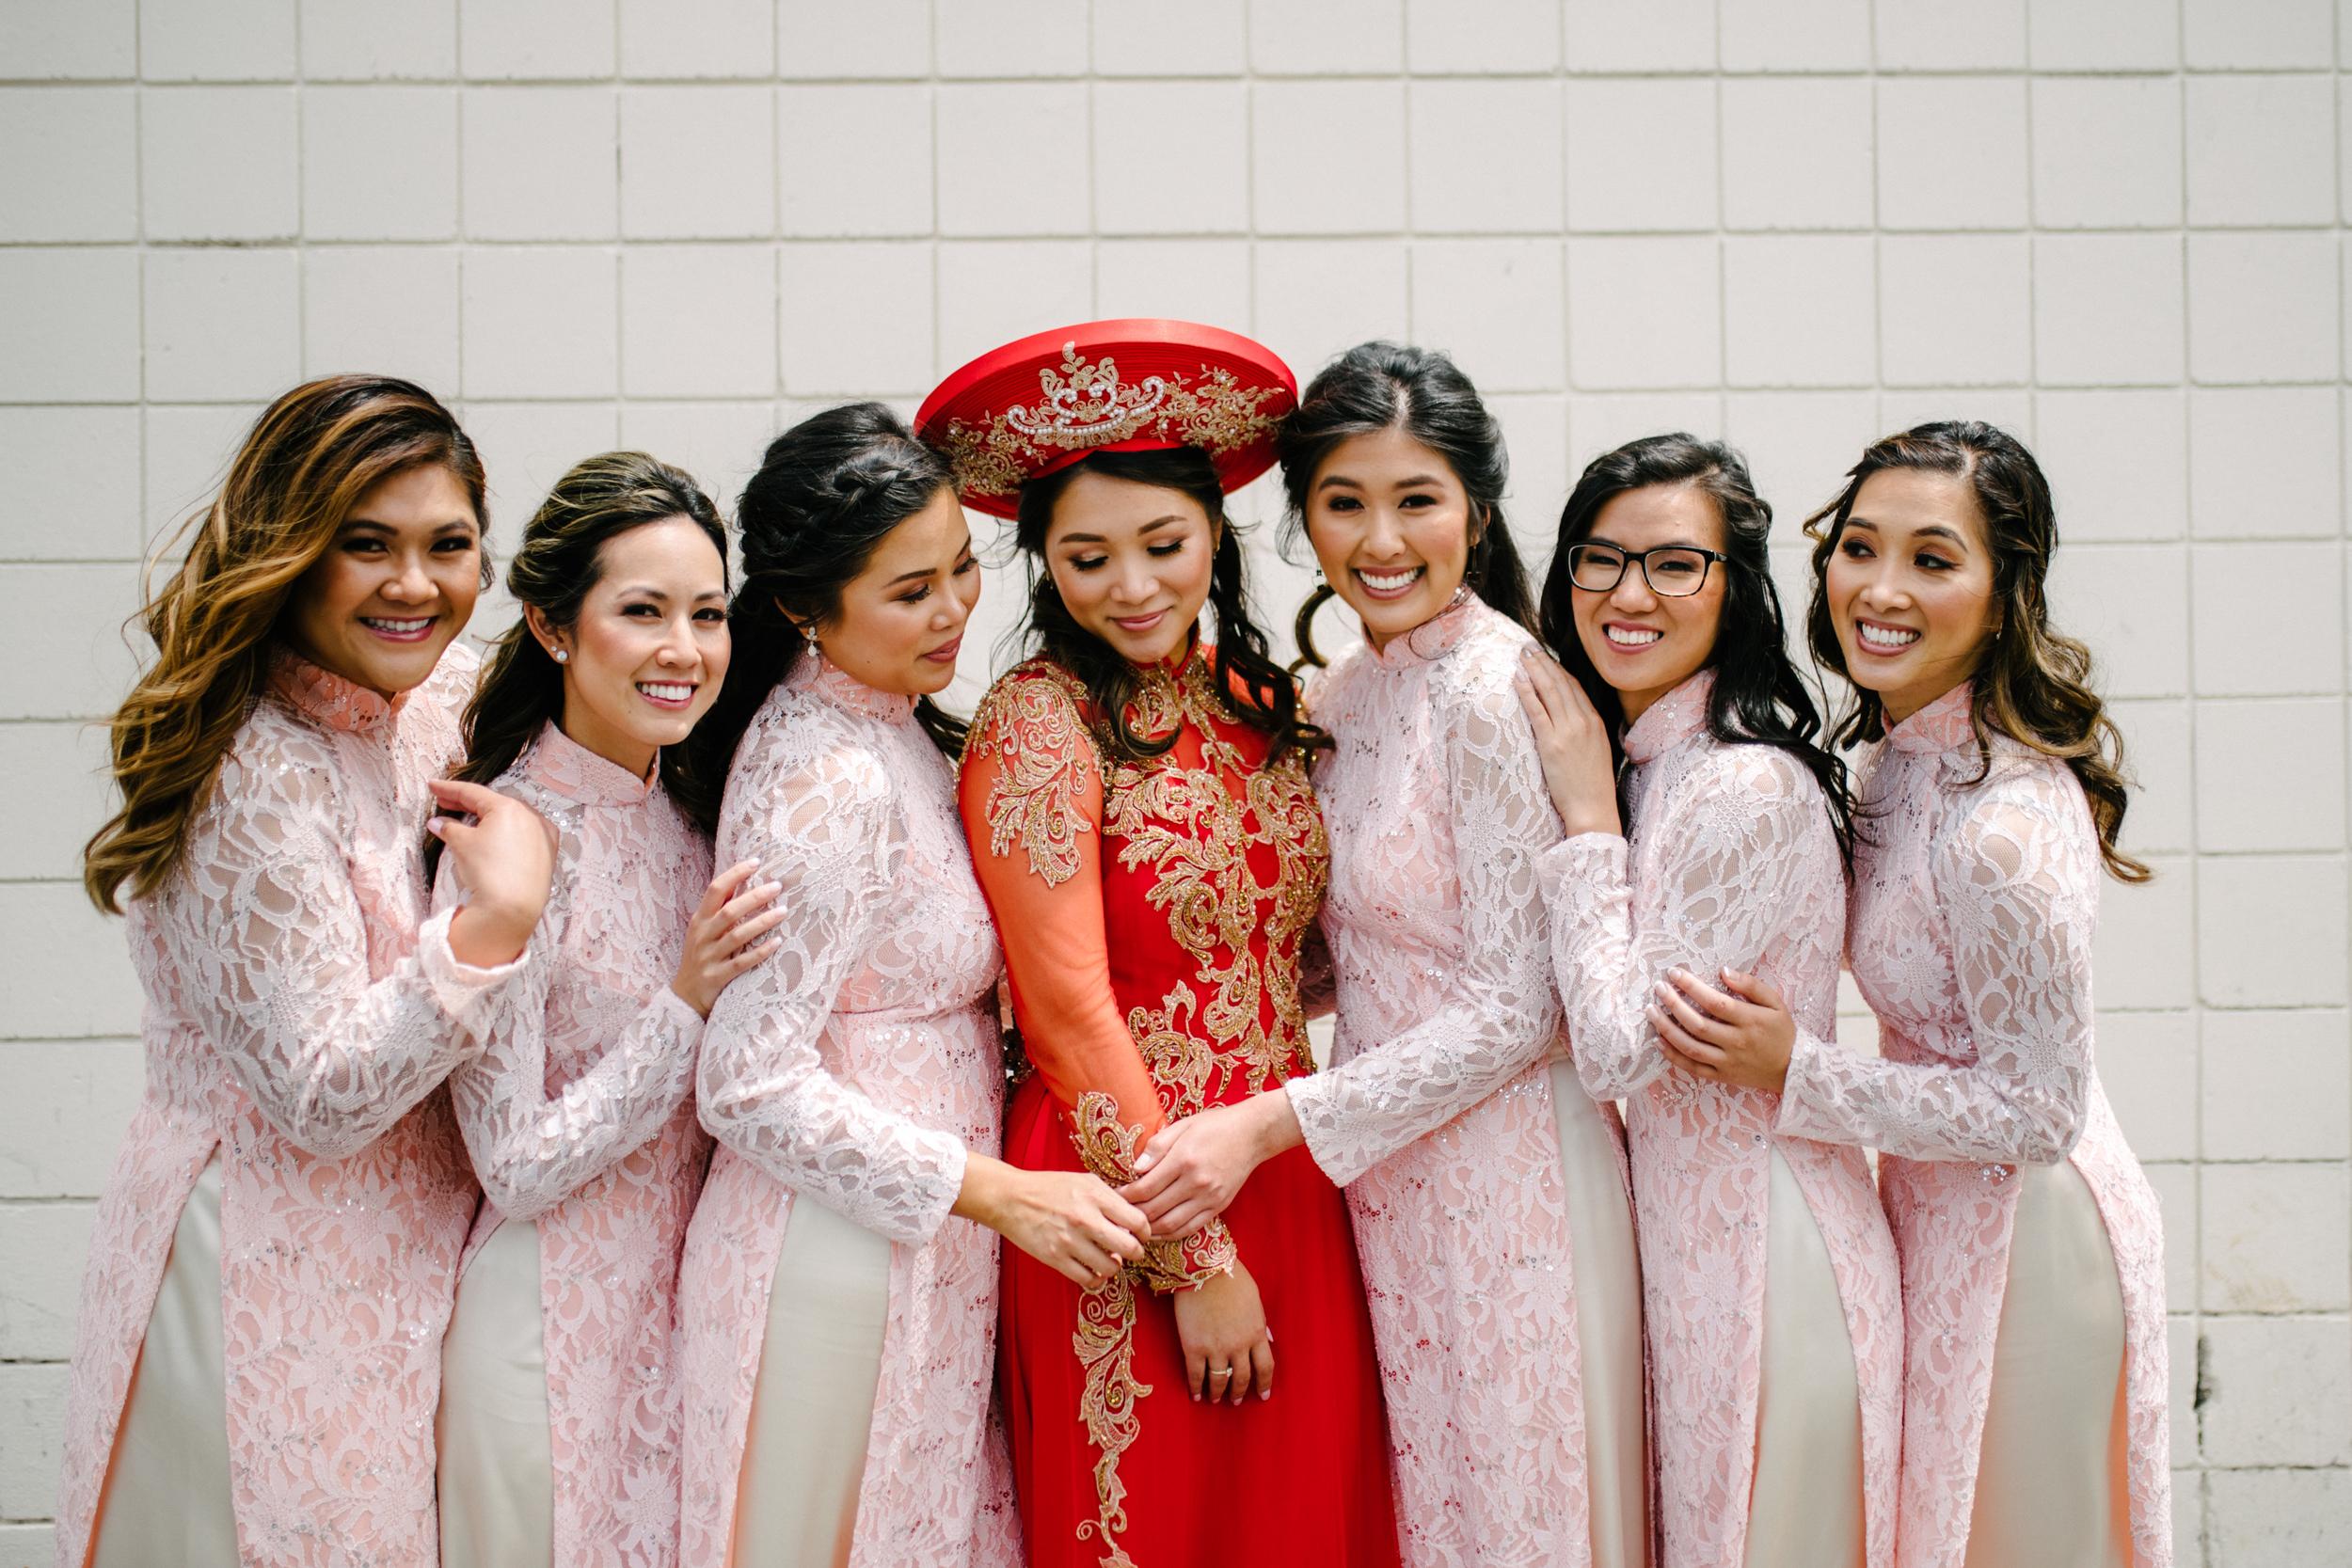 wedding_coronado_community_center-7.jpg